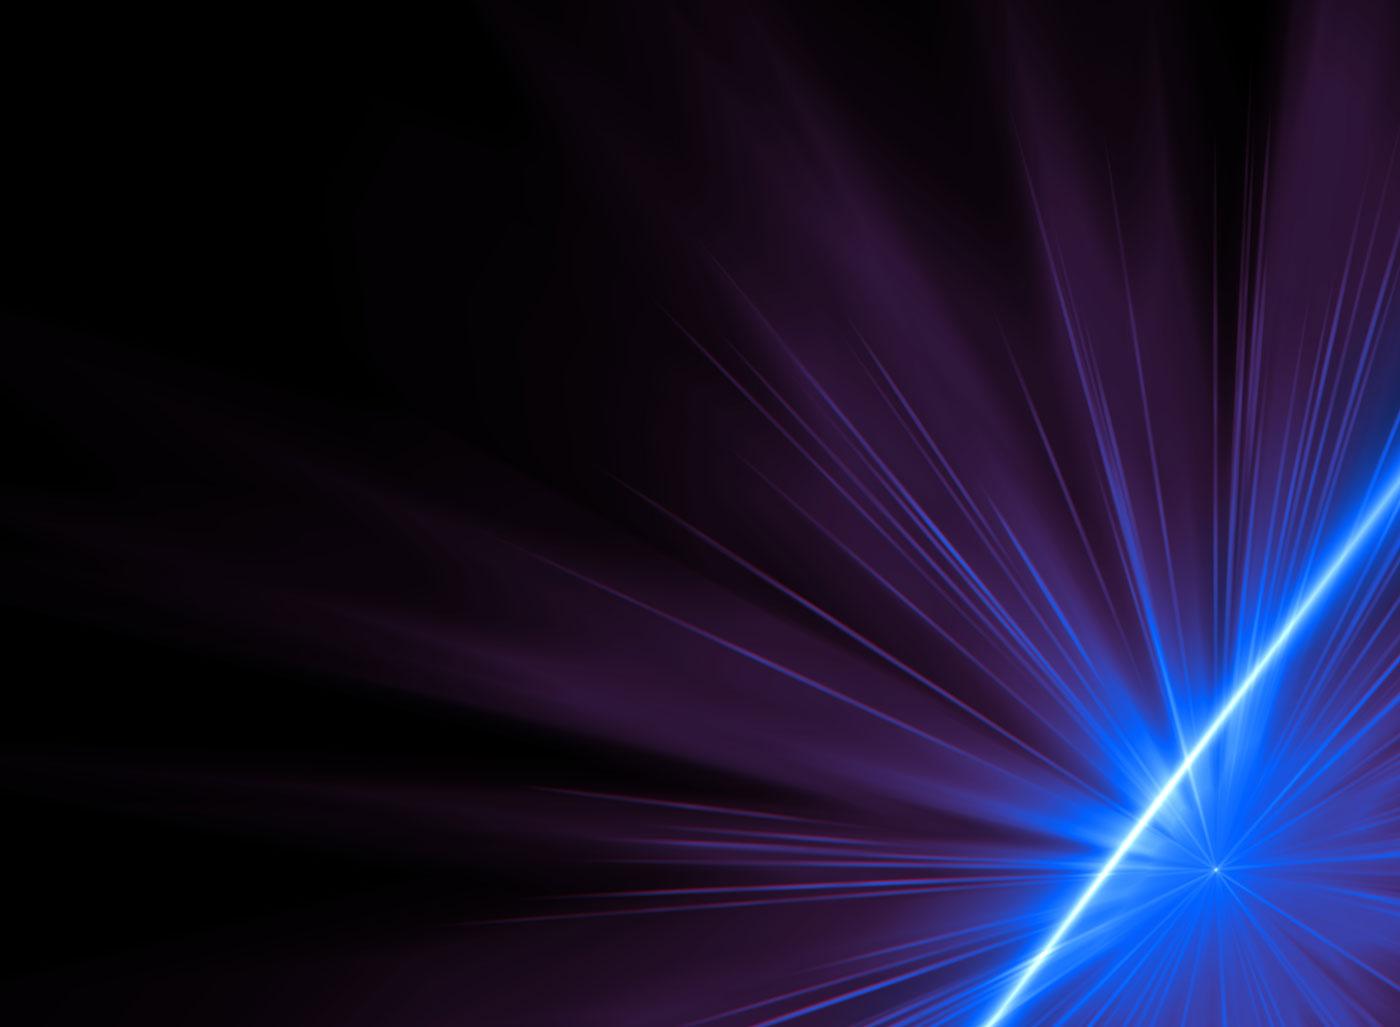 View of blue laser light